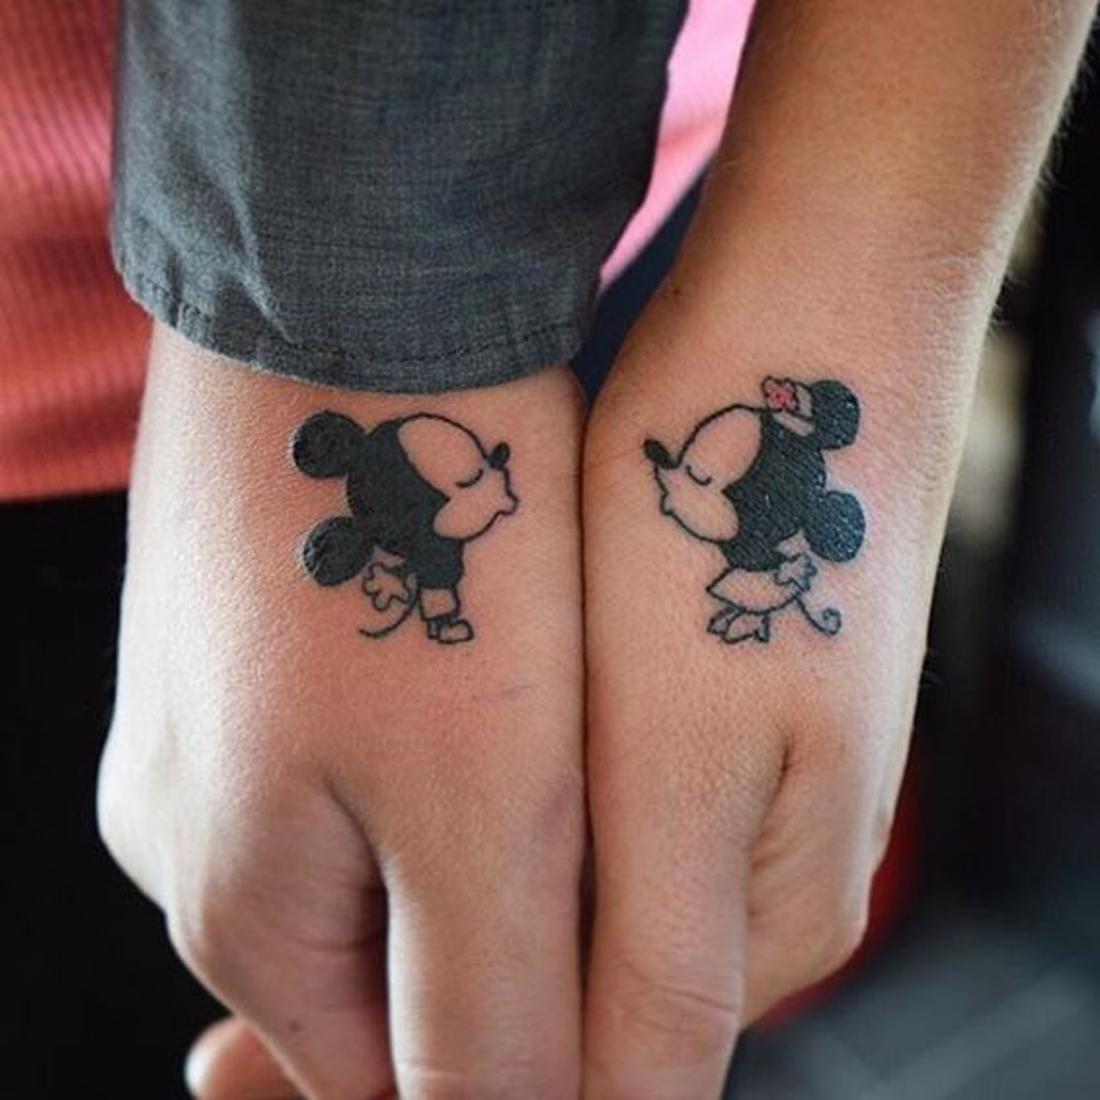 tatuajes en pareja, mickey and mini, tatuajes complementarios, romántico, tatuaje en las manos